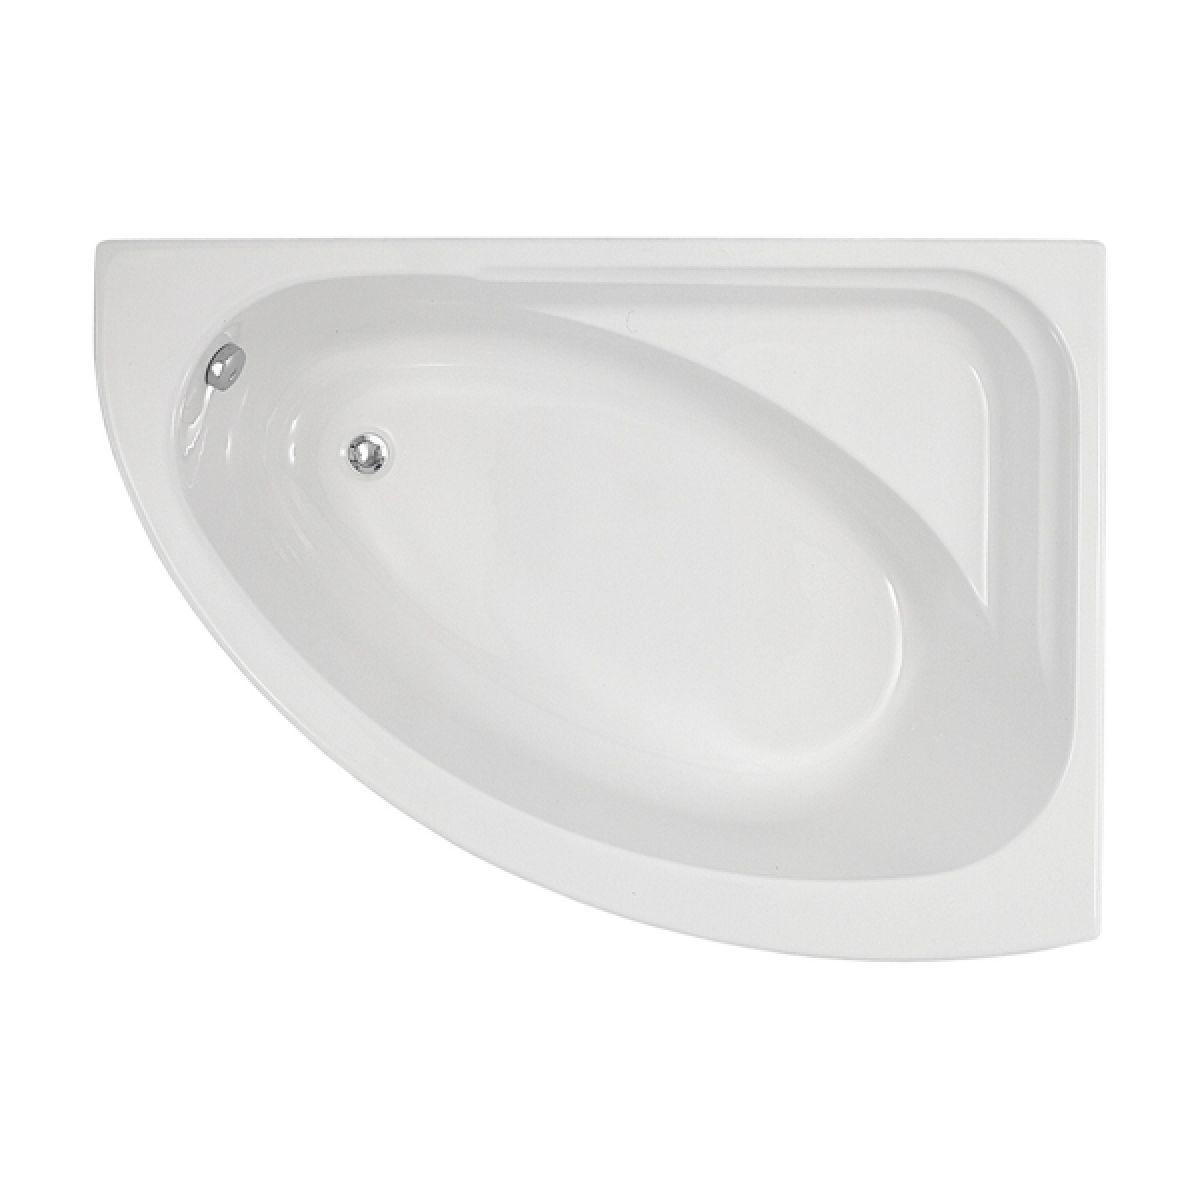 Frontline Orlah Luxury Offset Corner Bath - Right Hand